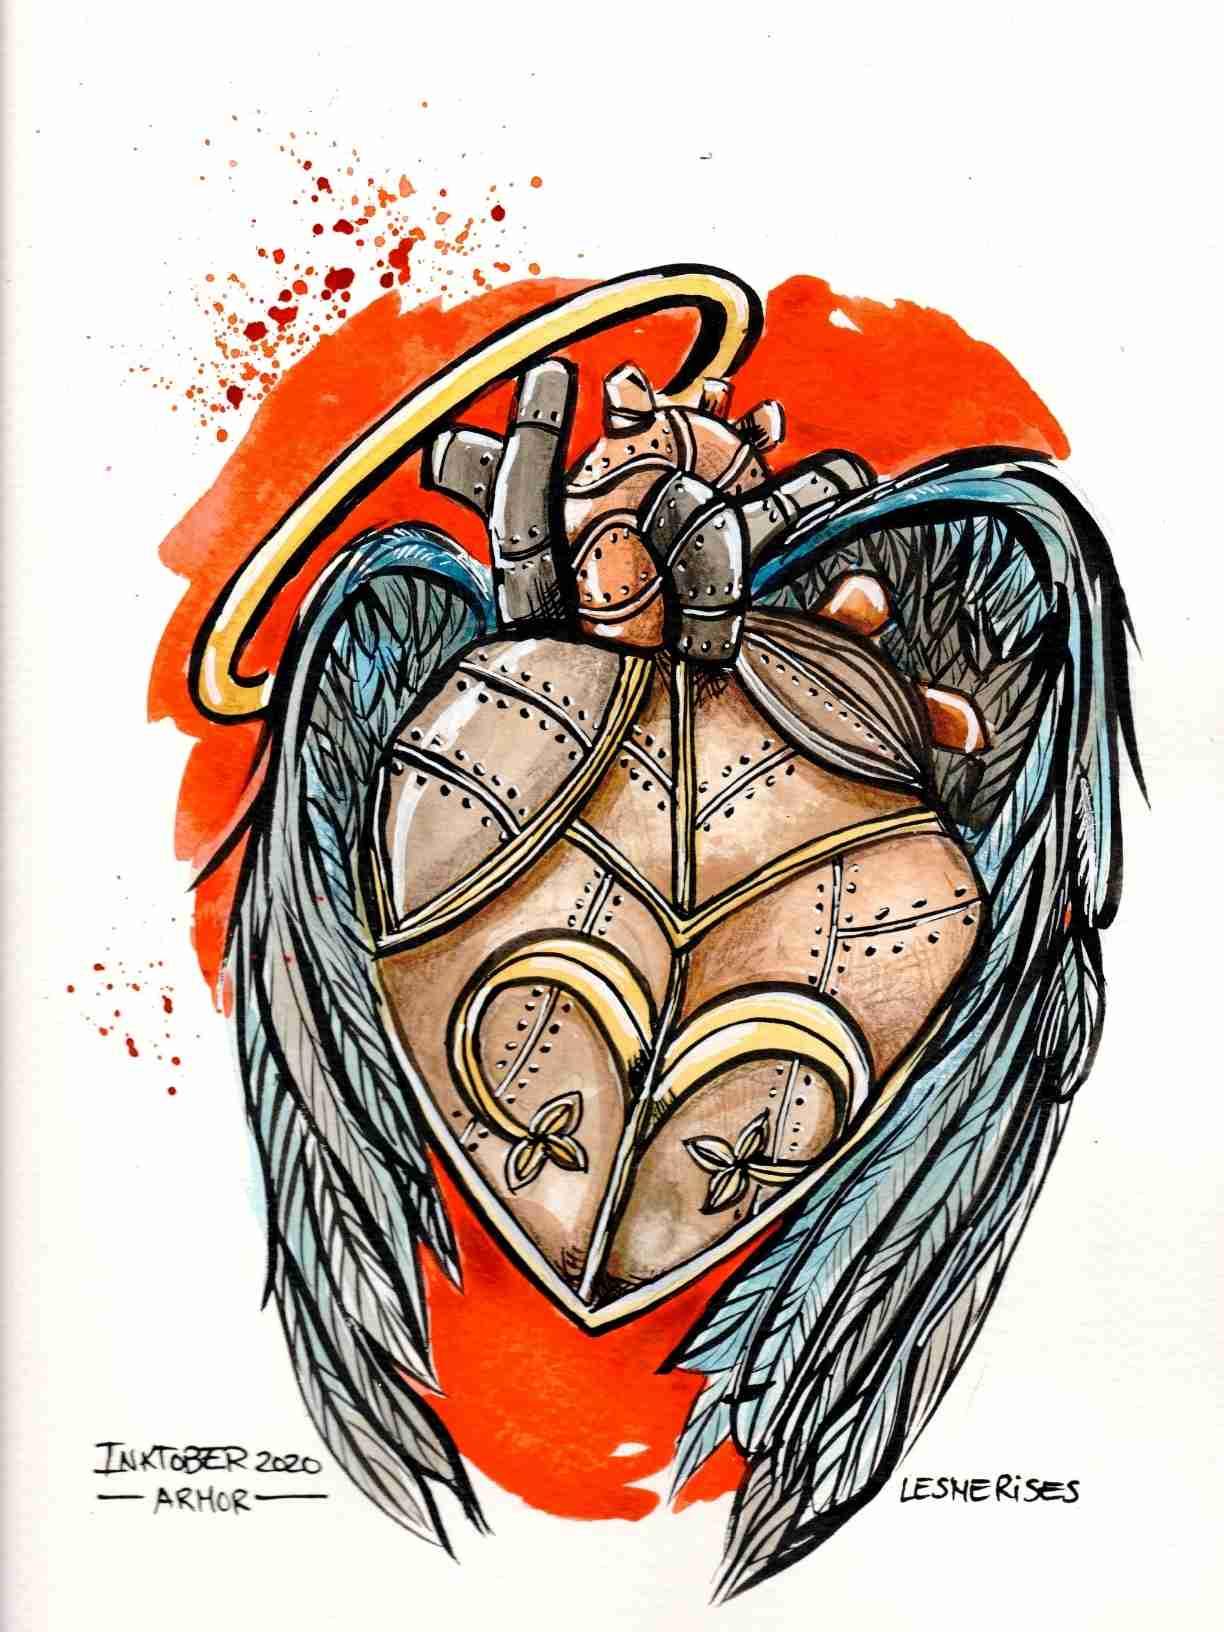 Aquarelle illustration armor